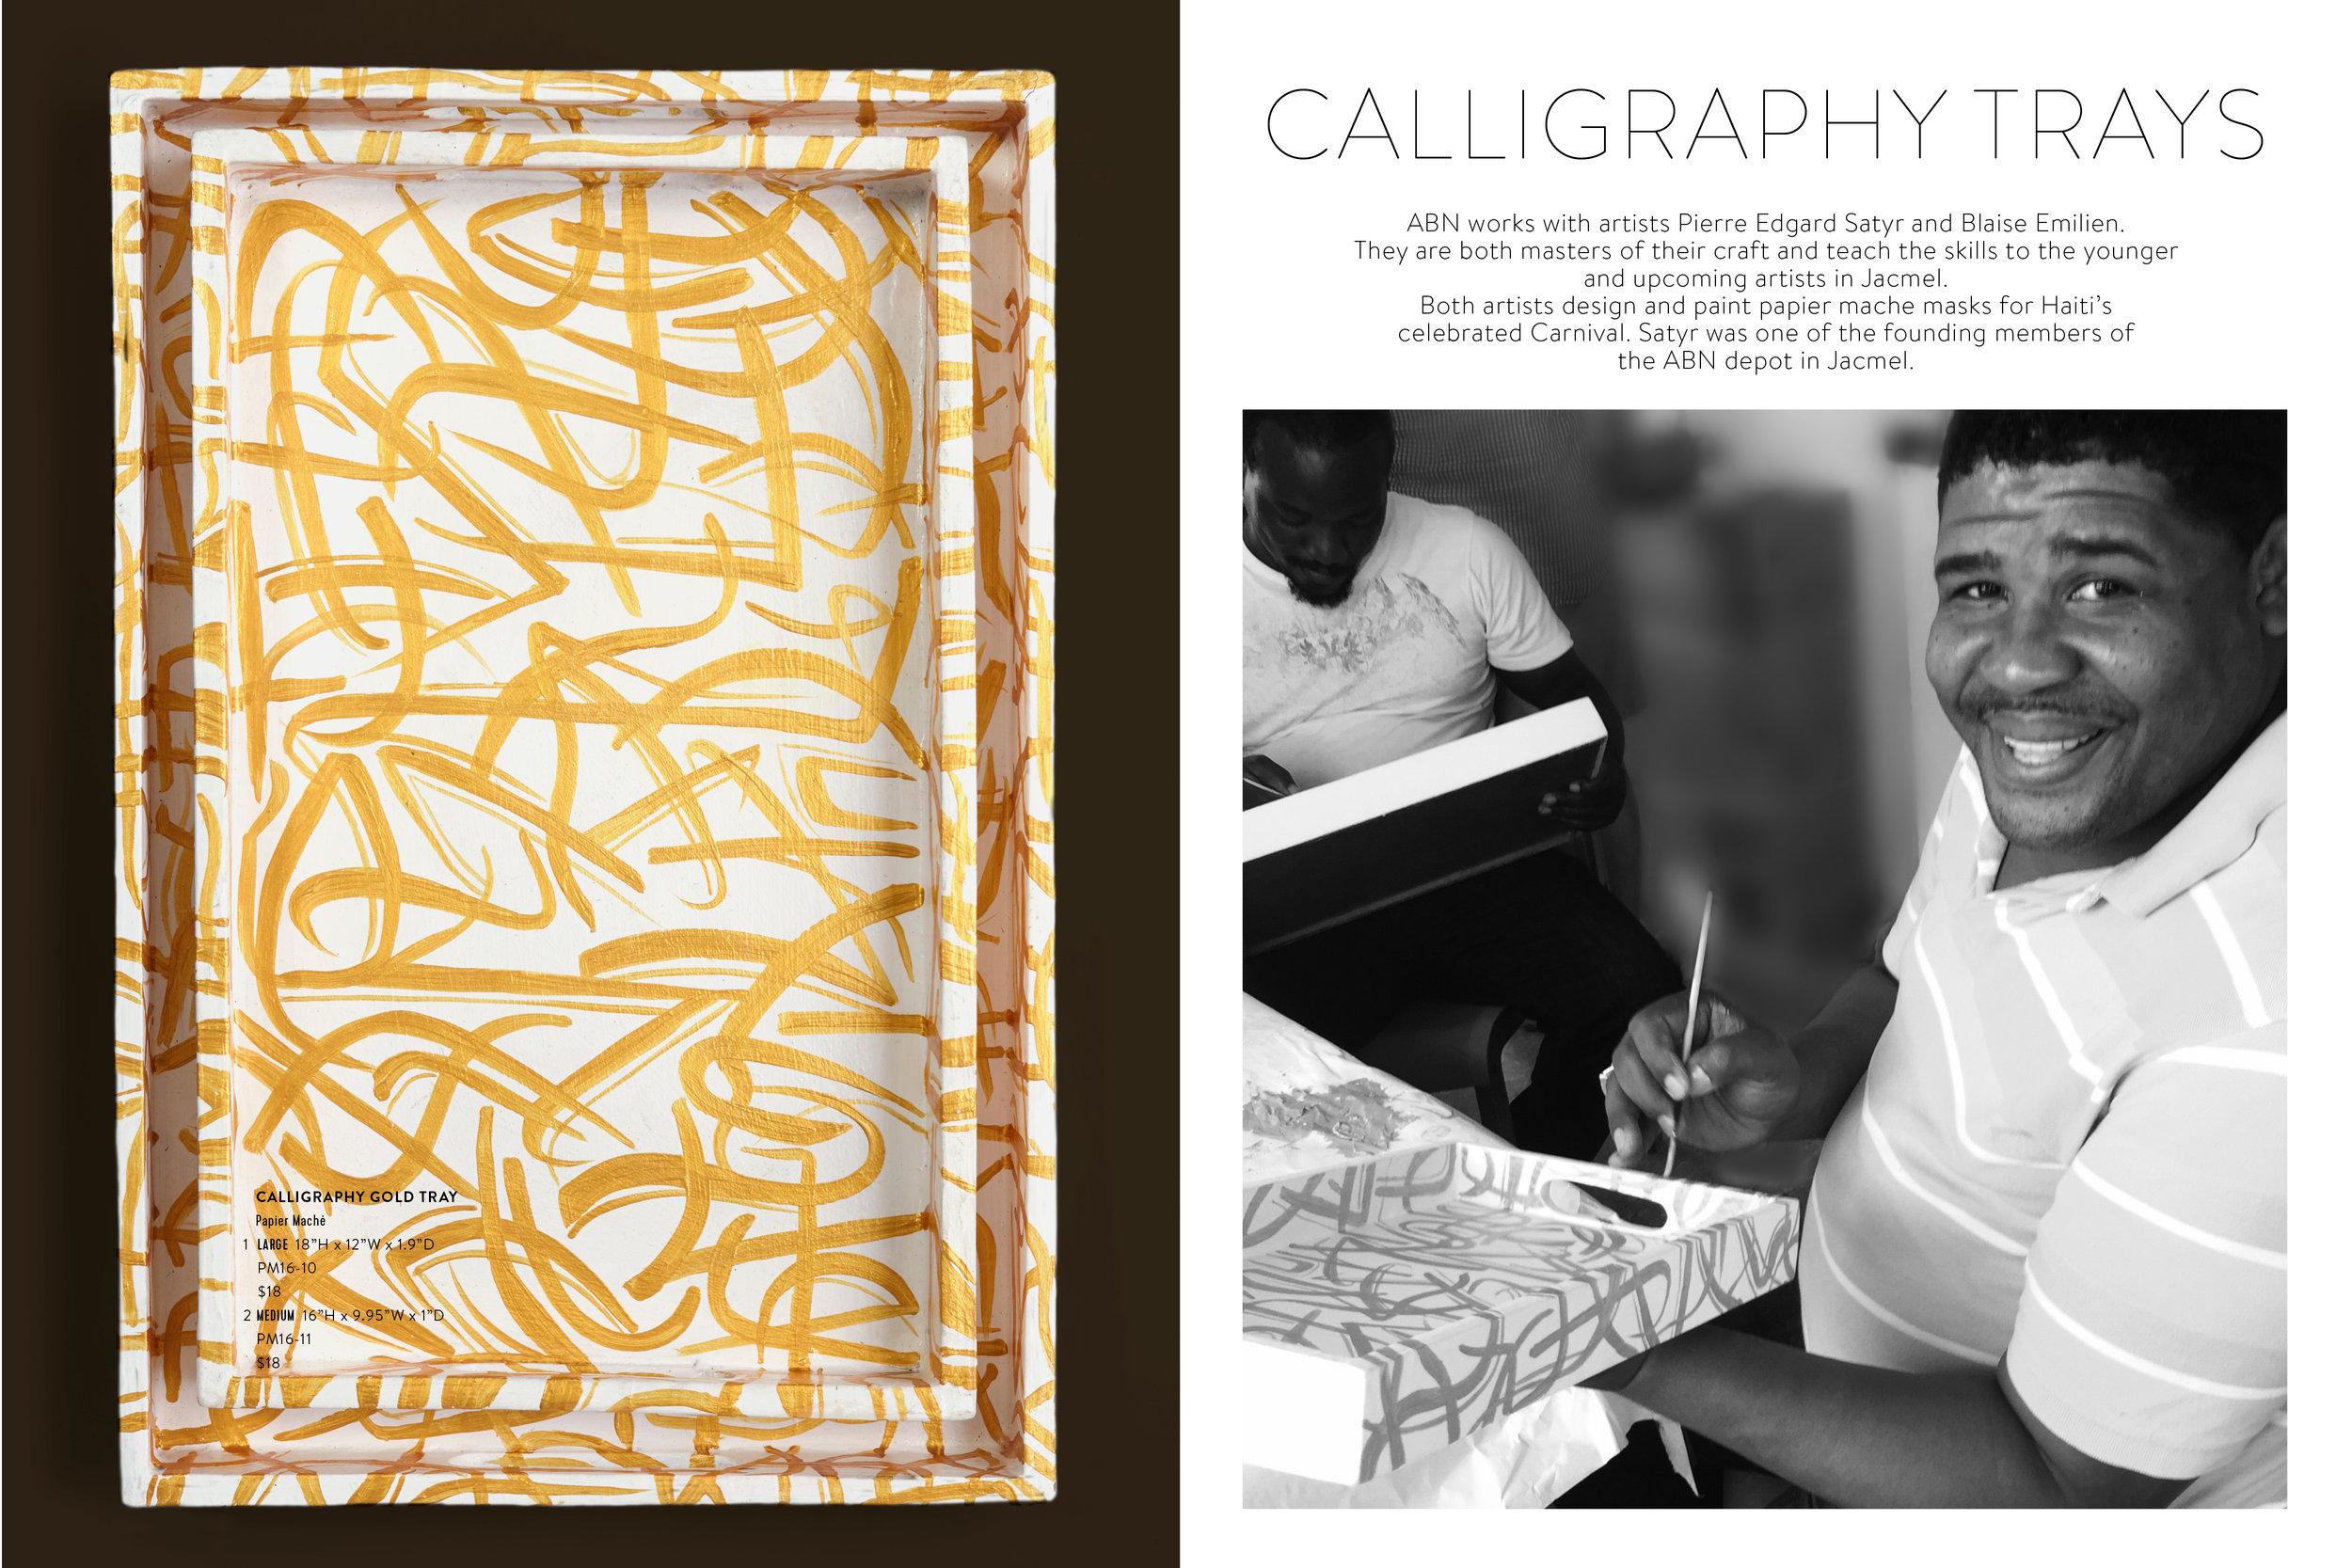 ABN Haiti Flint and Kent Alex Bates Artisan Product Design Joseph deLeo handmade sustainable design image